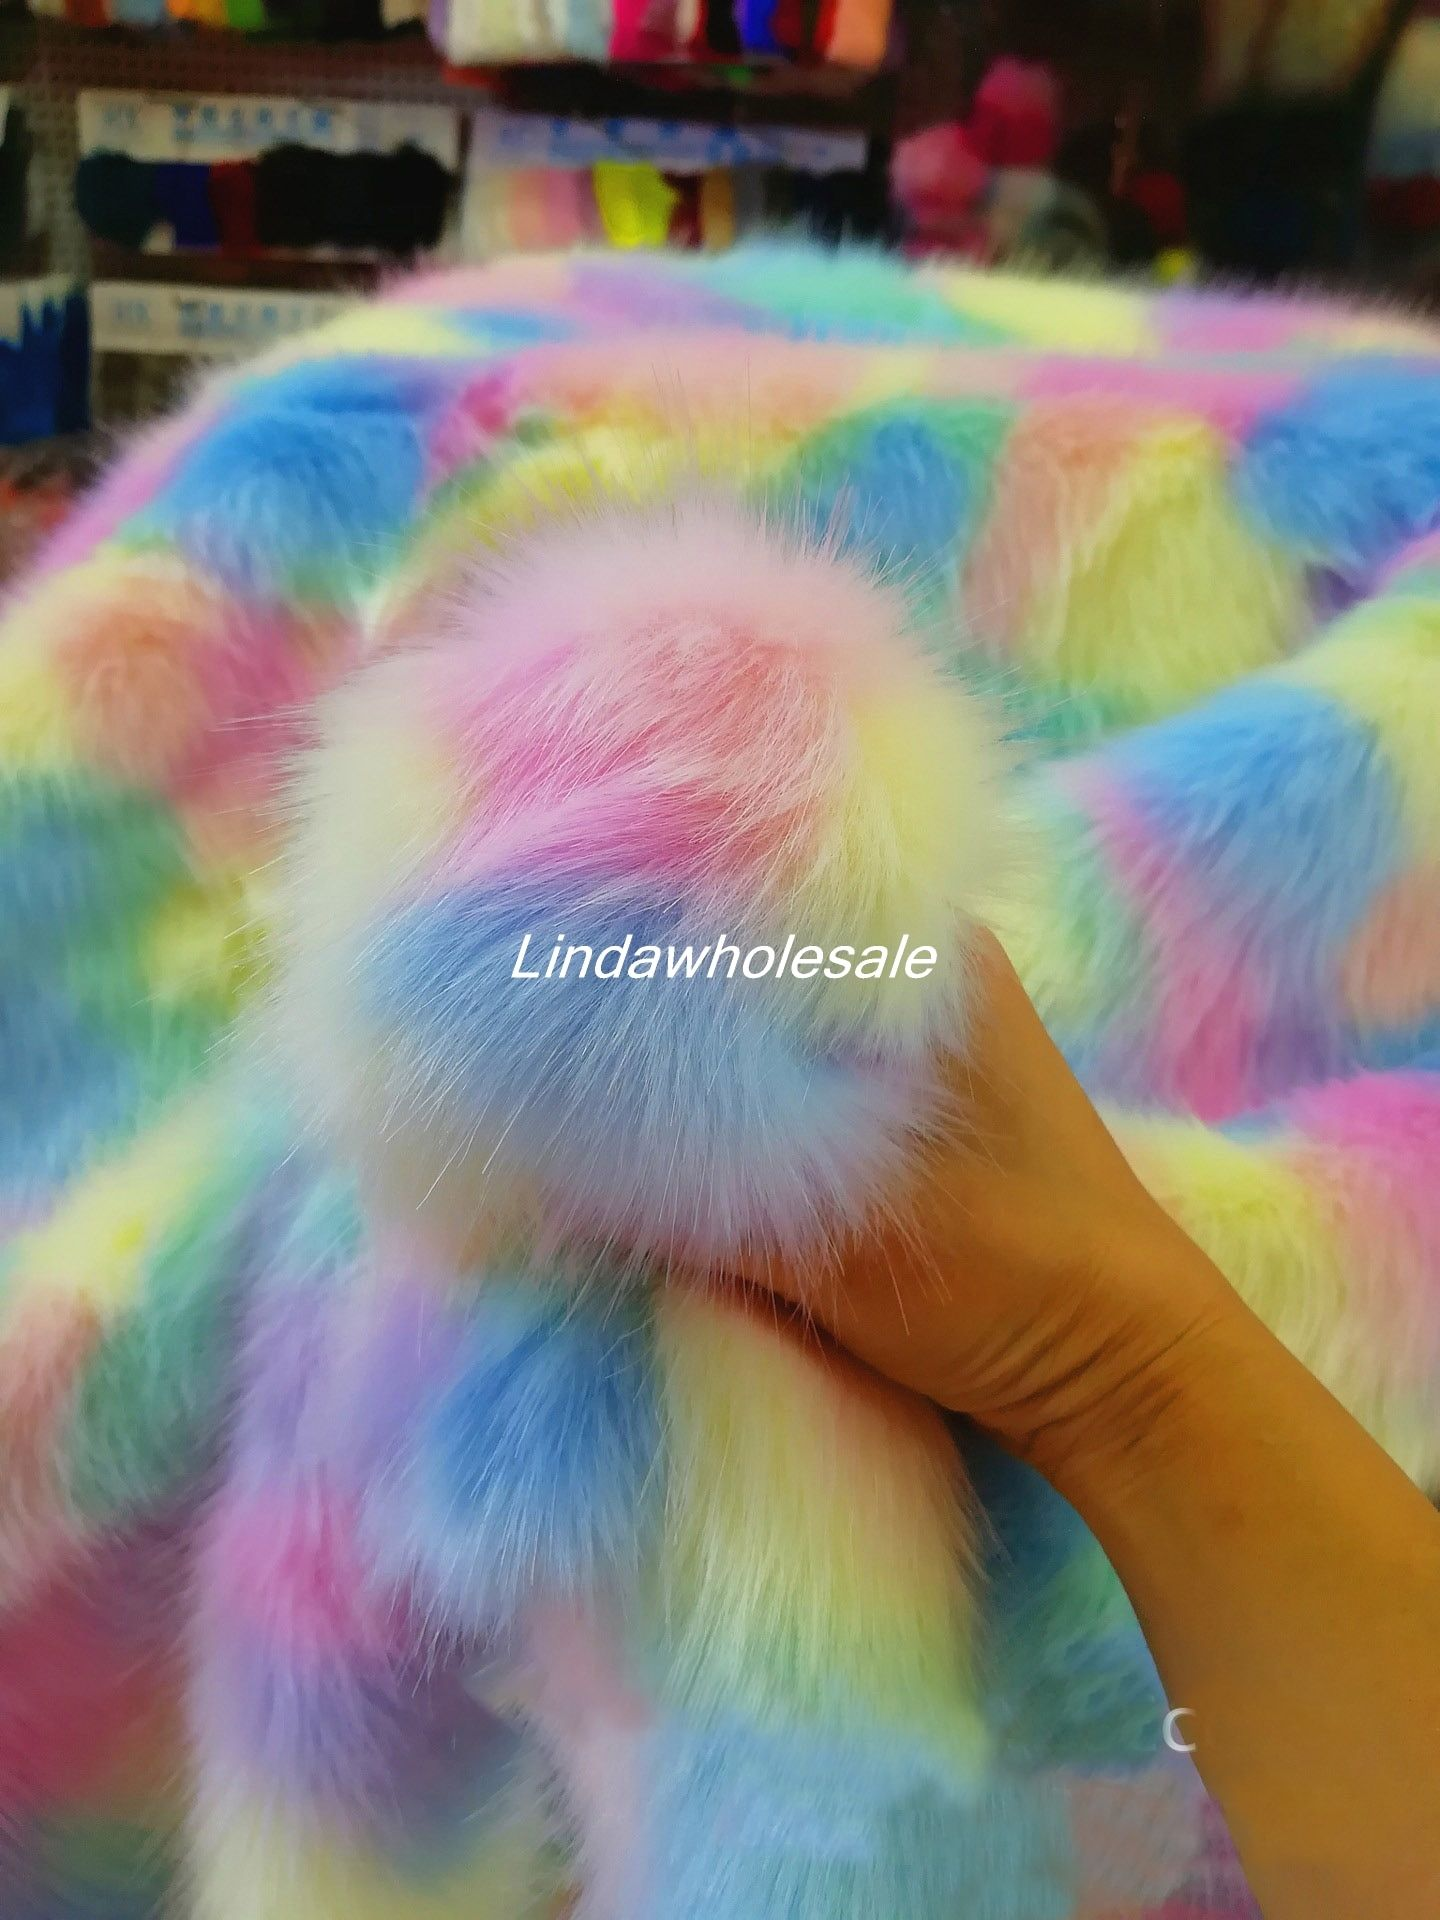 Regenbogen plüsch Jacquard stoff Multicolor fuchs pelz, fühlte tuch, faux pelz stoff. kleidung zubehör, 170 cm * 90 cm (hof)/stücke